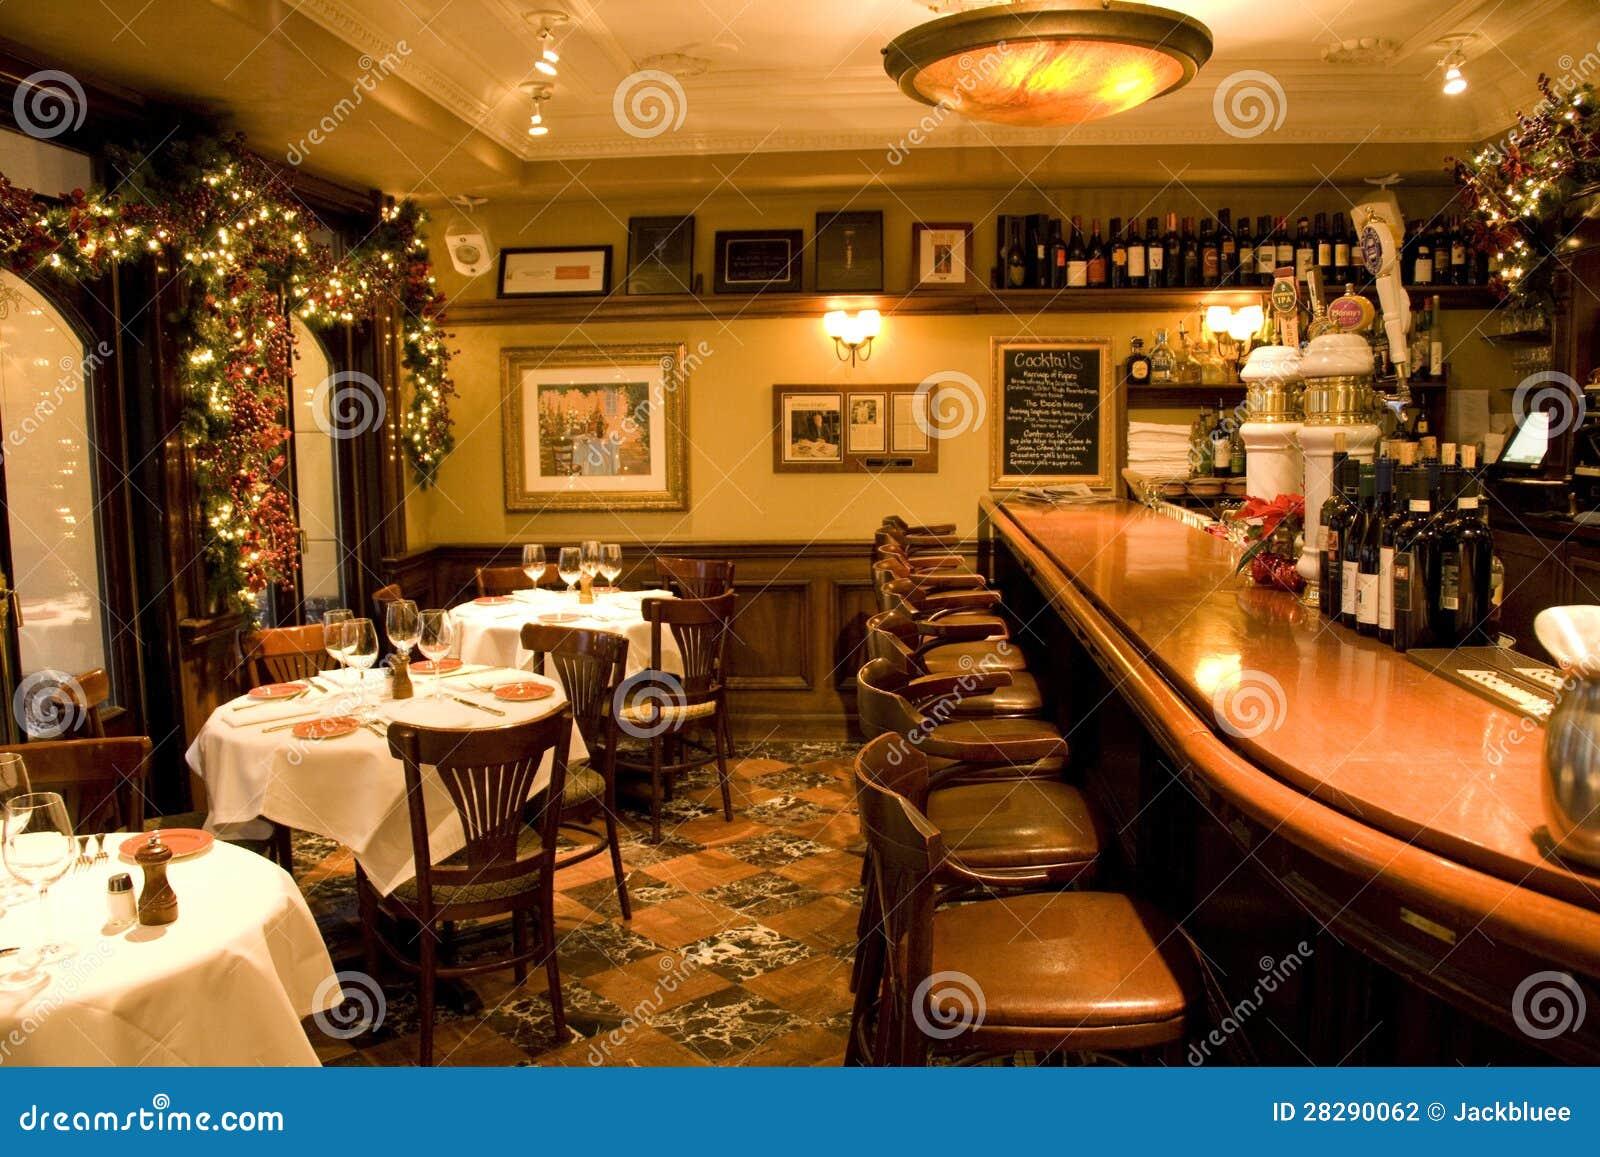 Redding California premier restaurant, wine bar and live